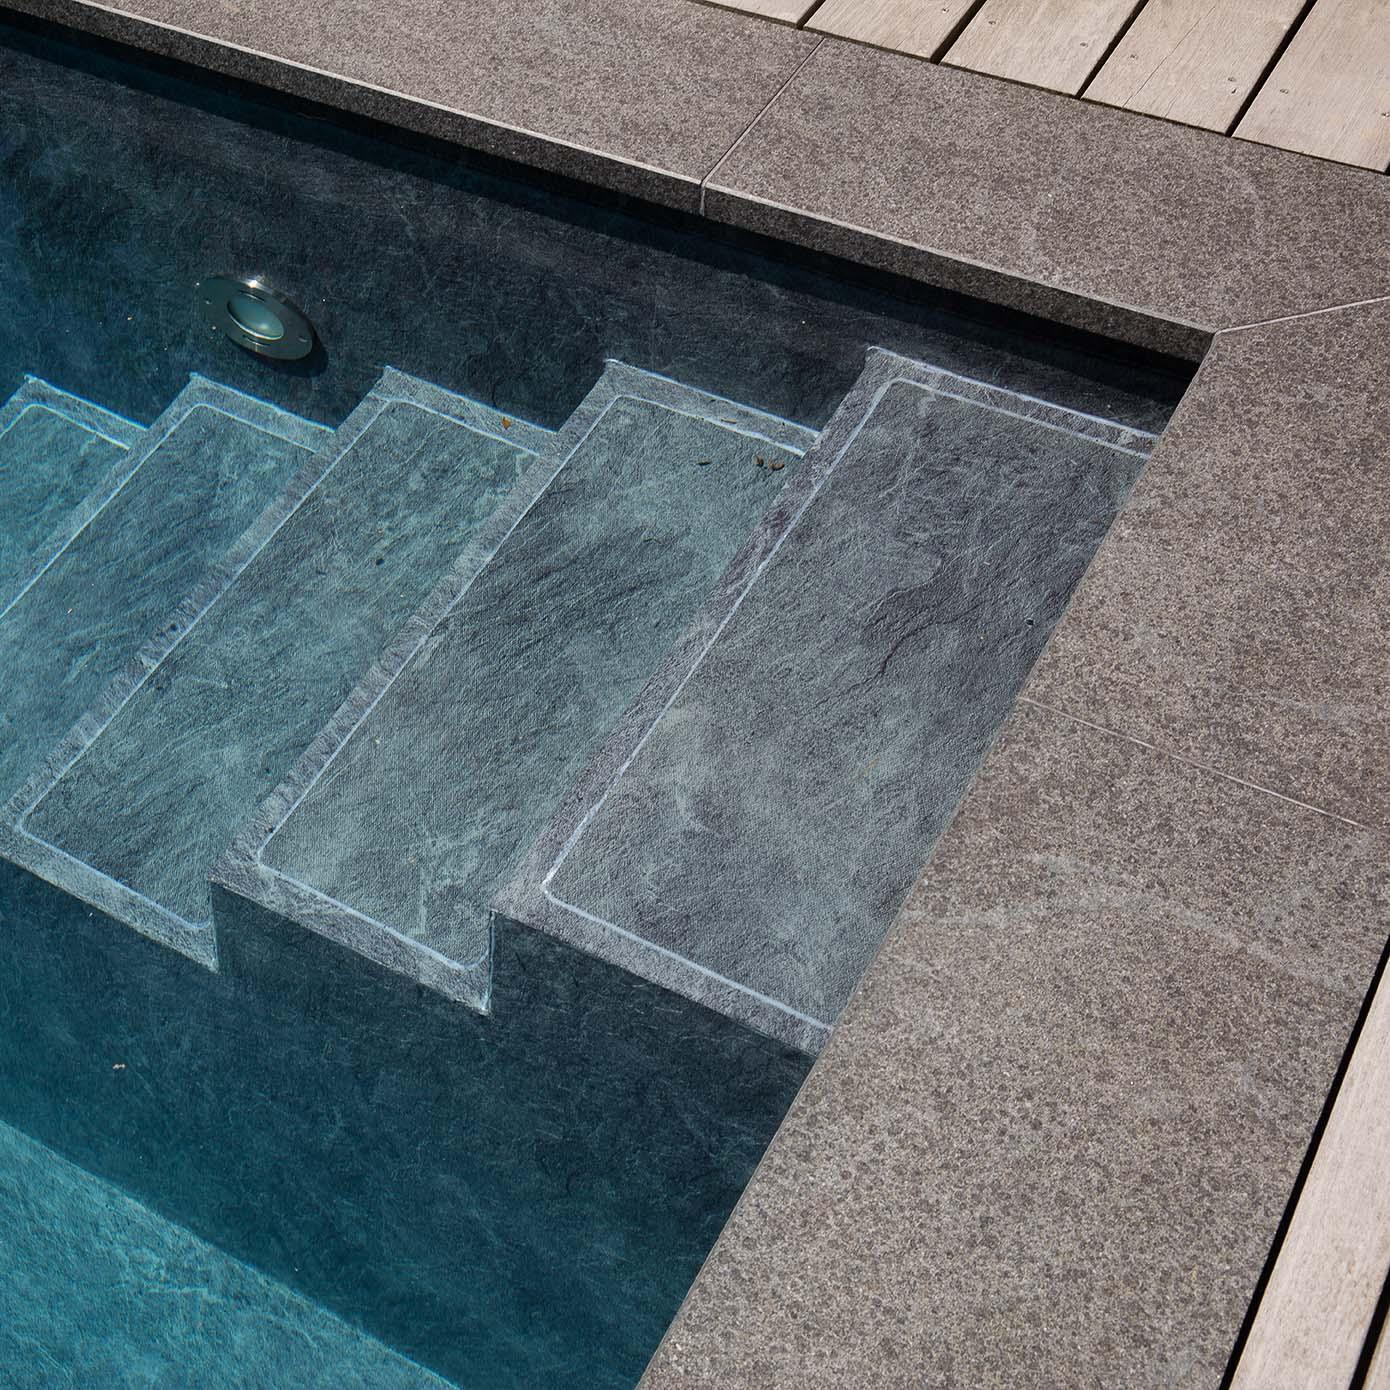 Materialkombination am Pool mit Itauba-Holz und Granit in dunklem Farbton.